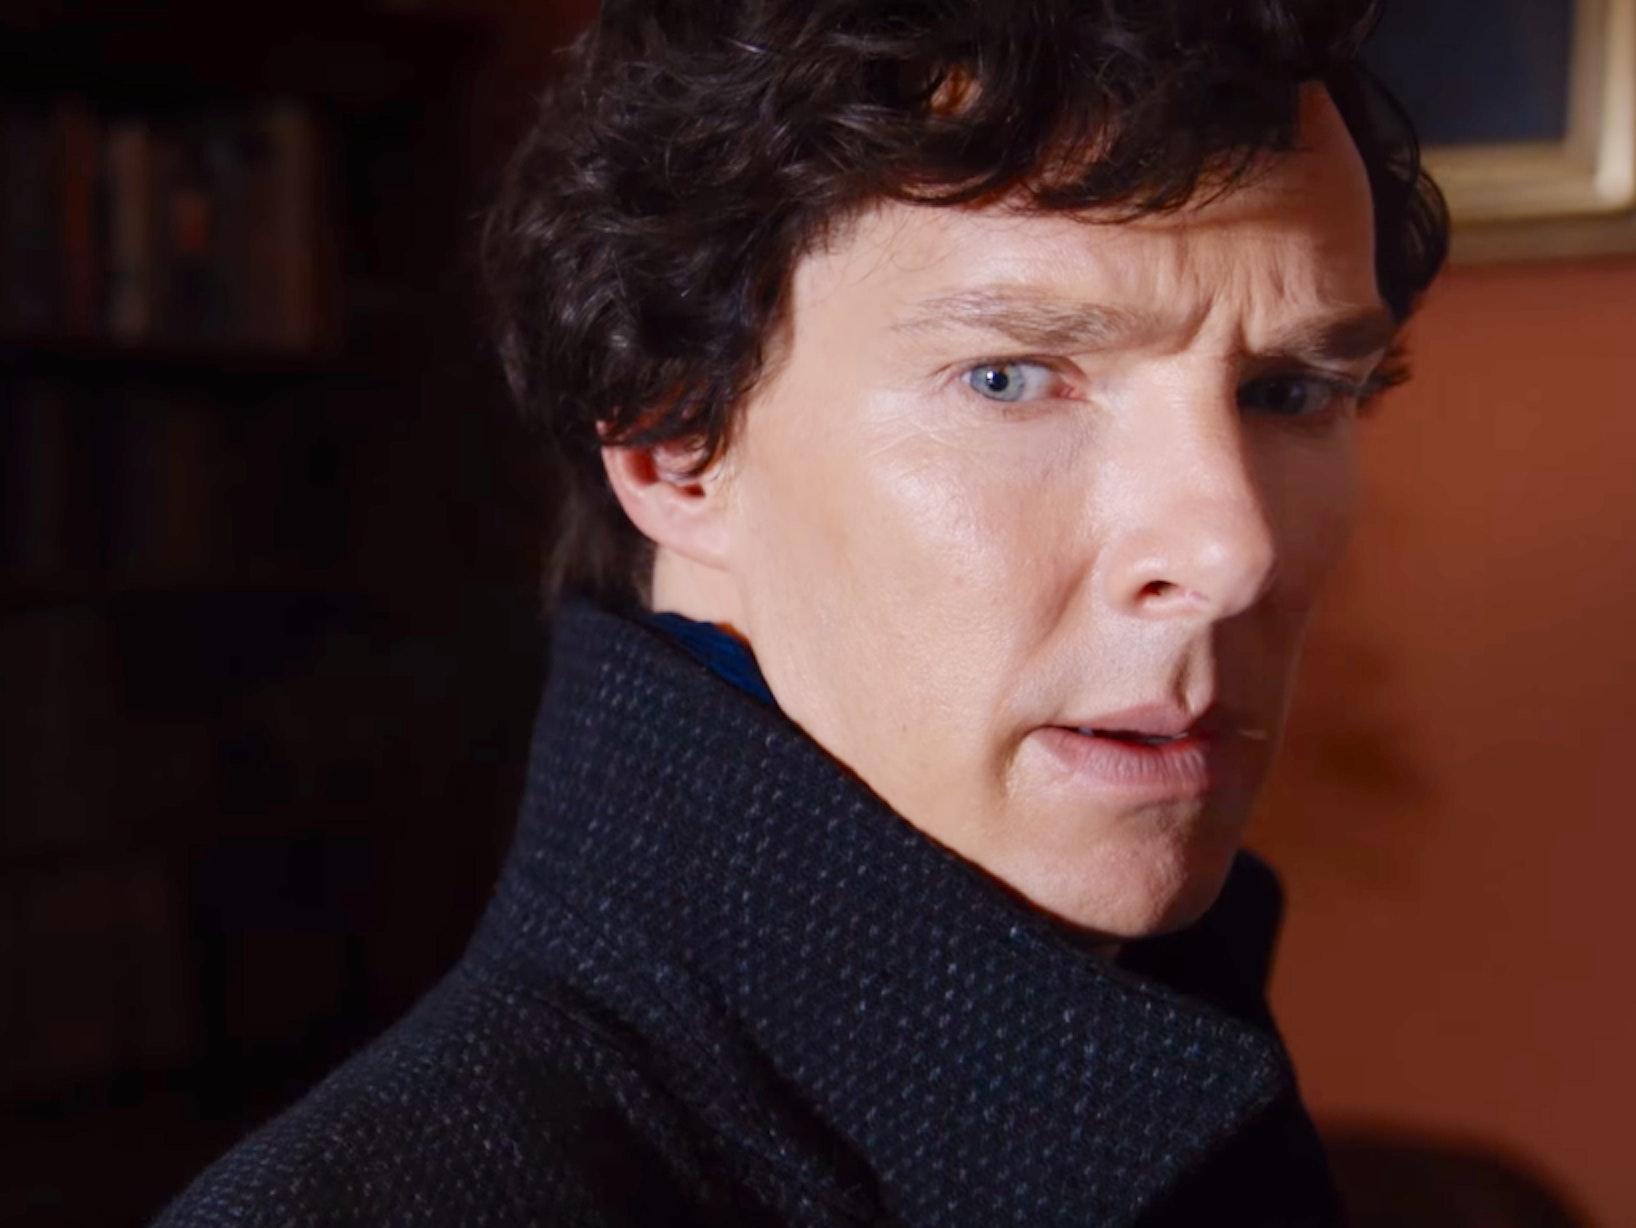 'Sherlock' Season 4 Trailer Sees the Return of Moriarty Maybe